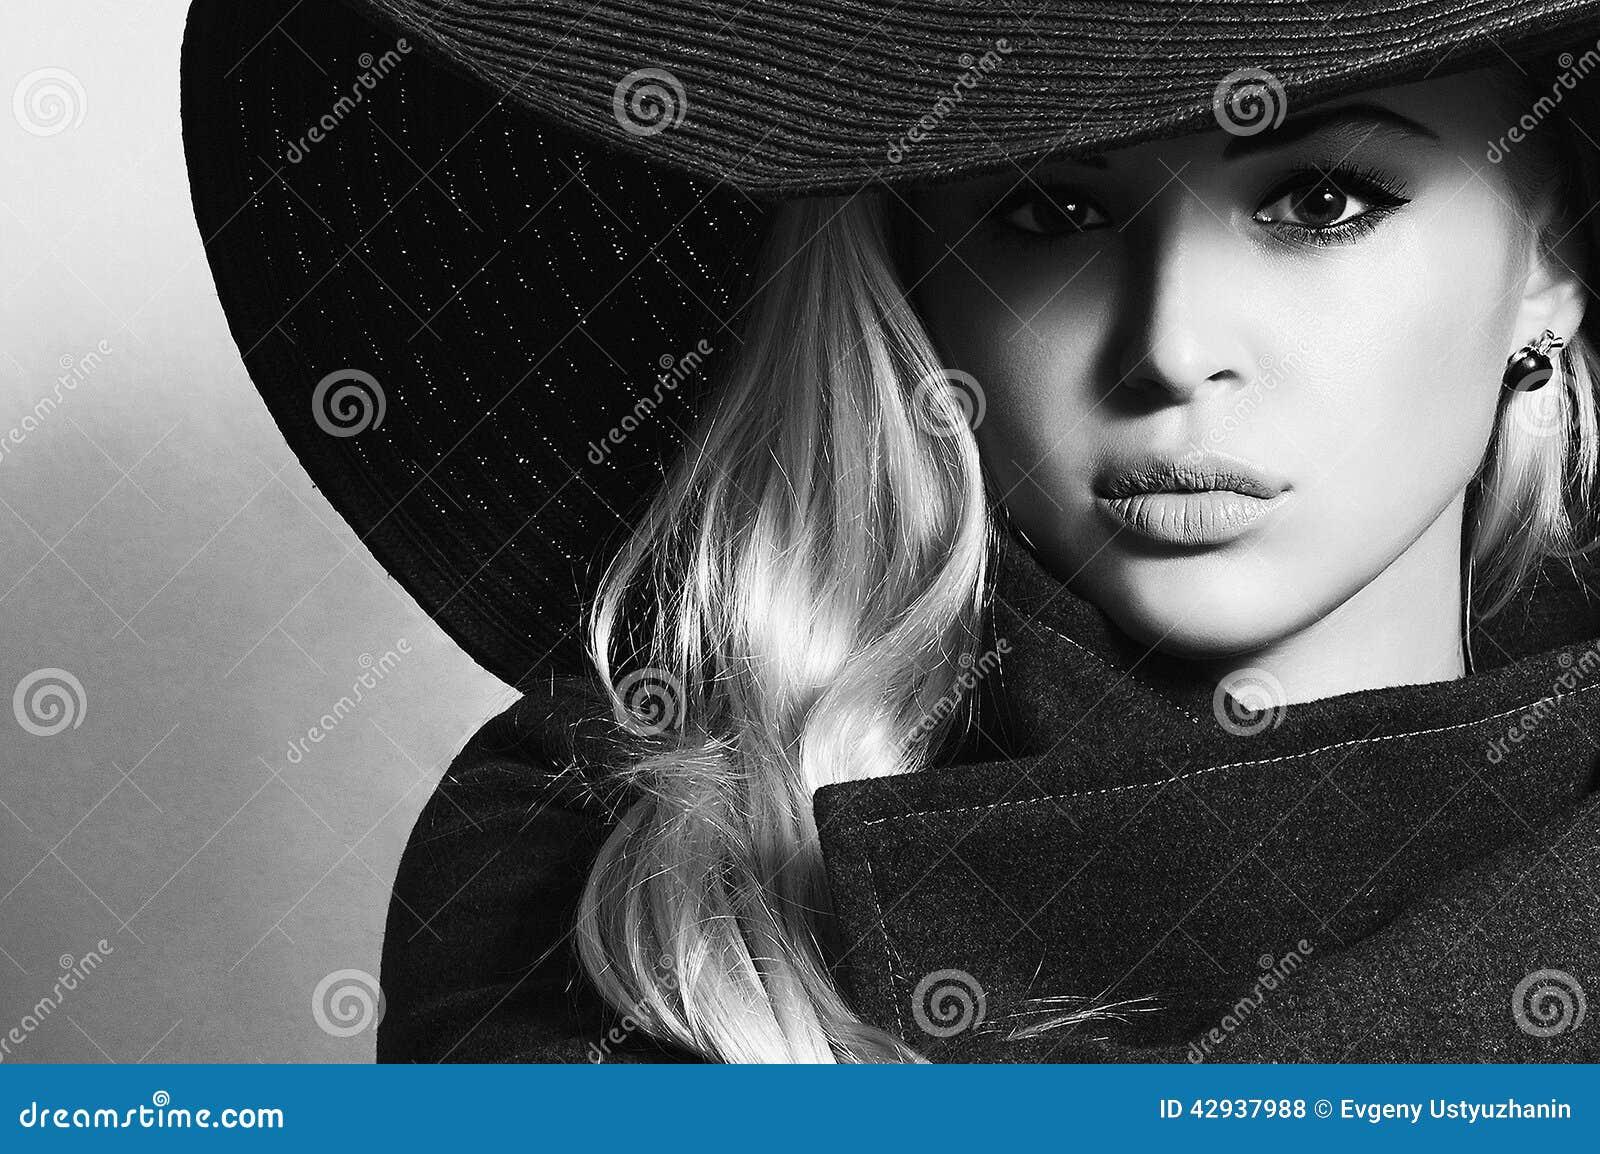 Monochrome portrait of Beautiful Blond Woman in Black Hat. Fashionable Lady in Topcoat